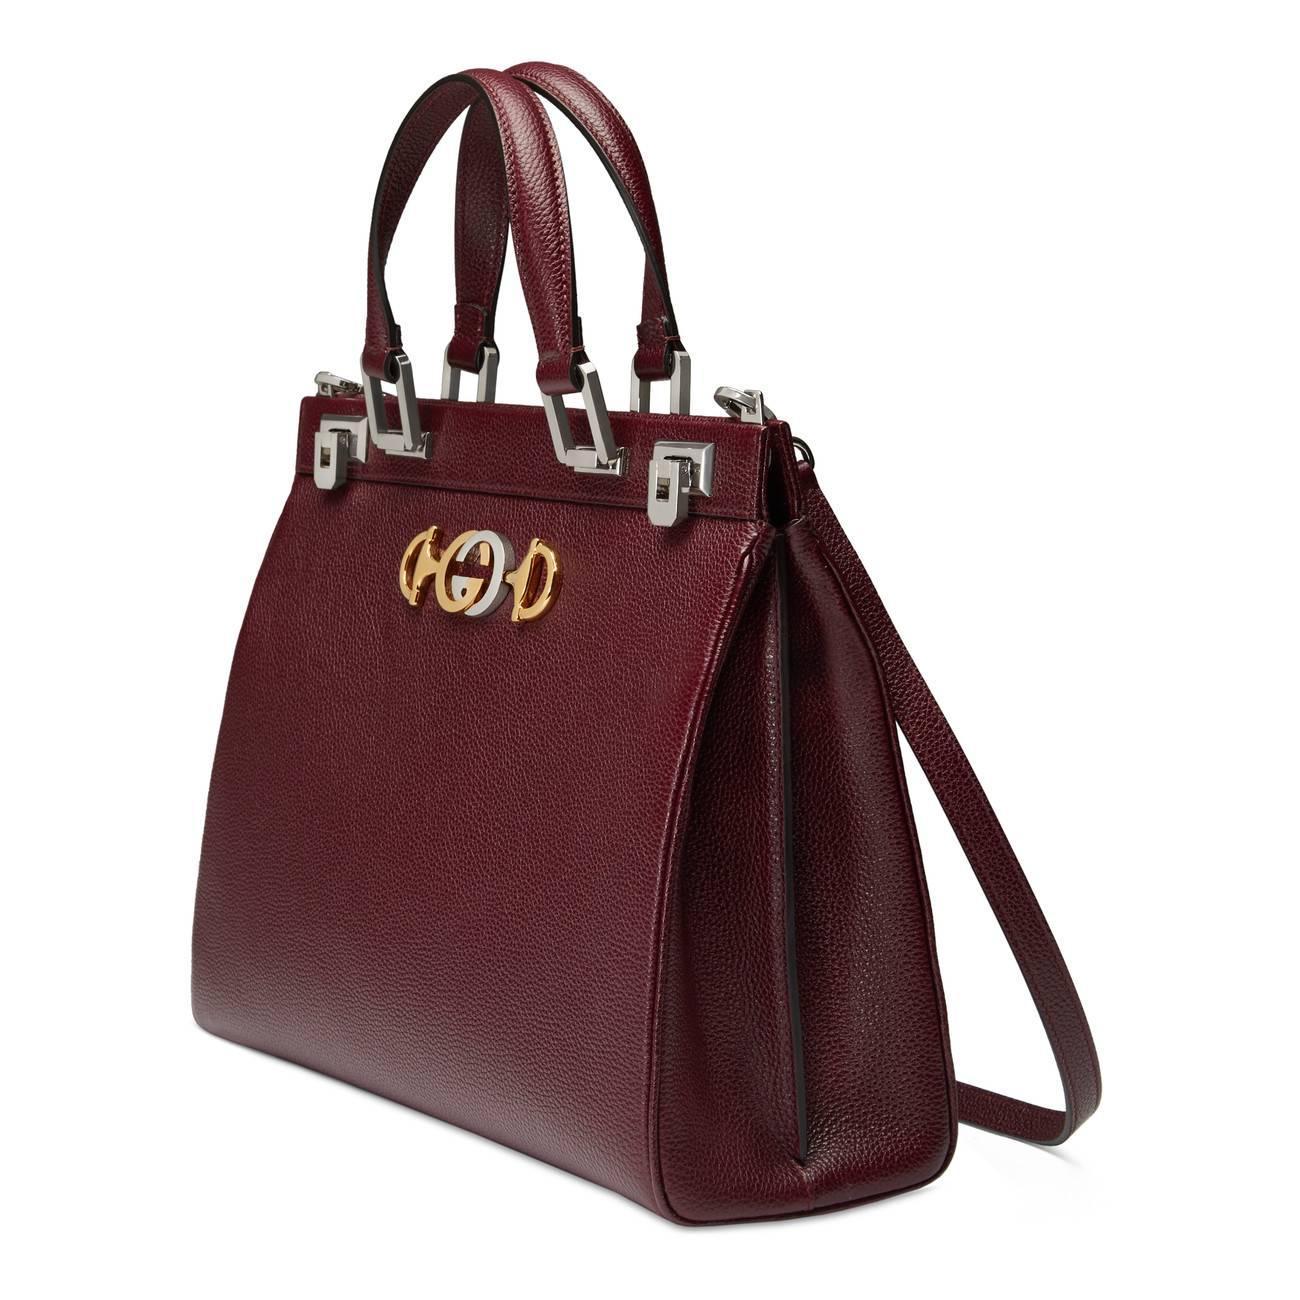 518a3b10cce Lyst - Gucci Zumi Grainy Leather Medium Top Handle Bag